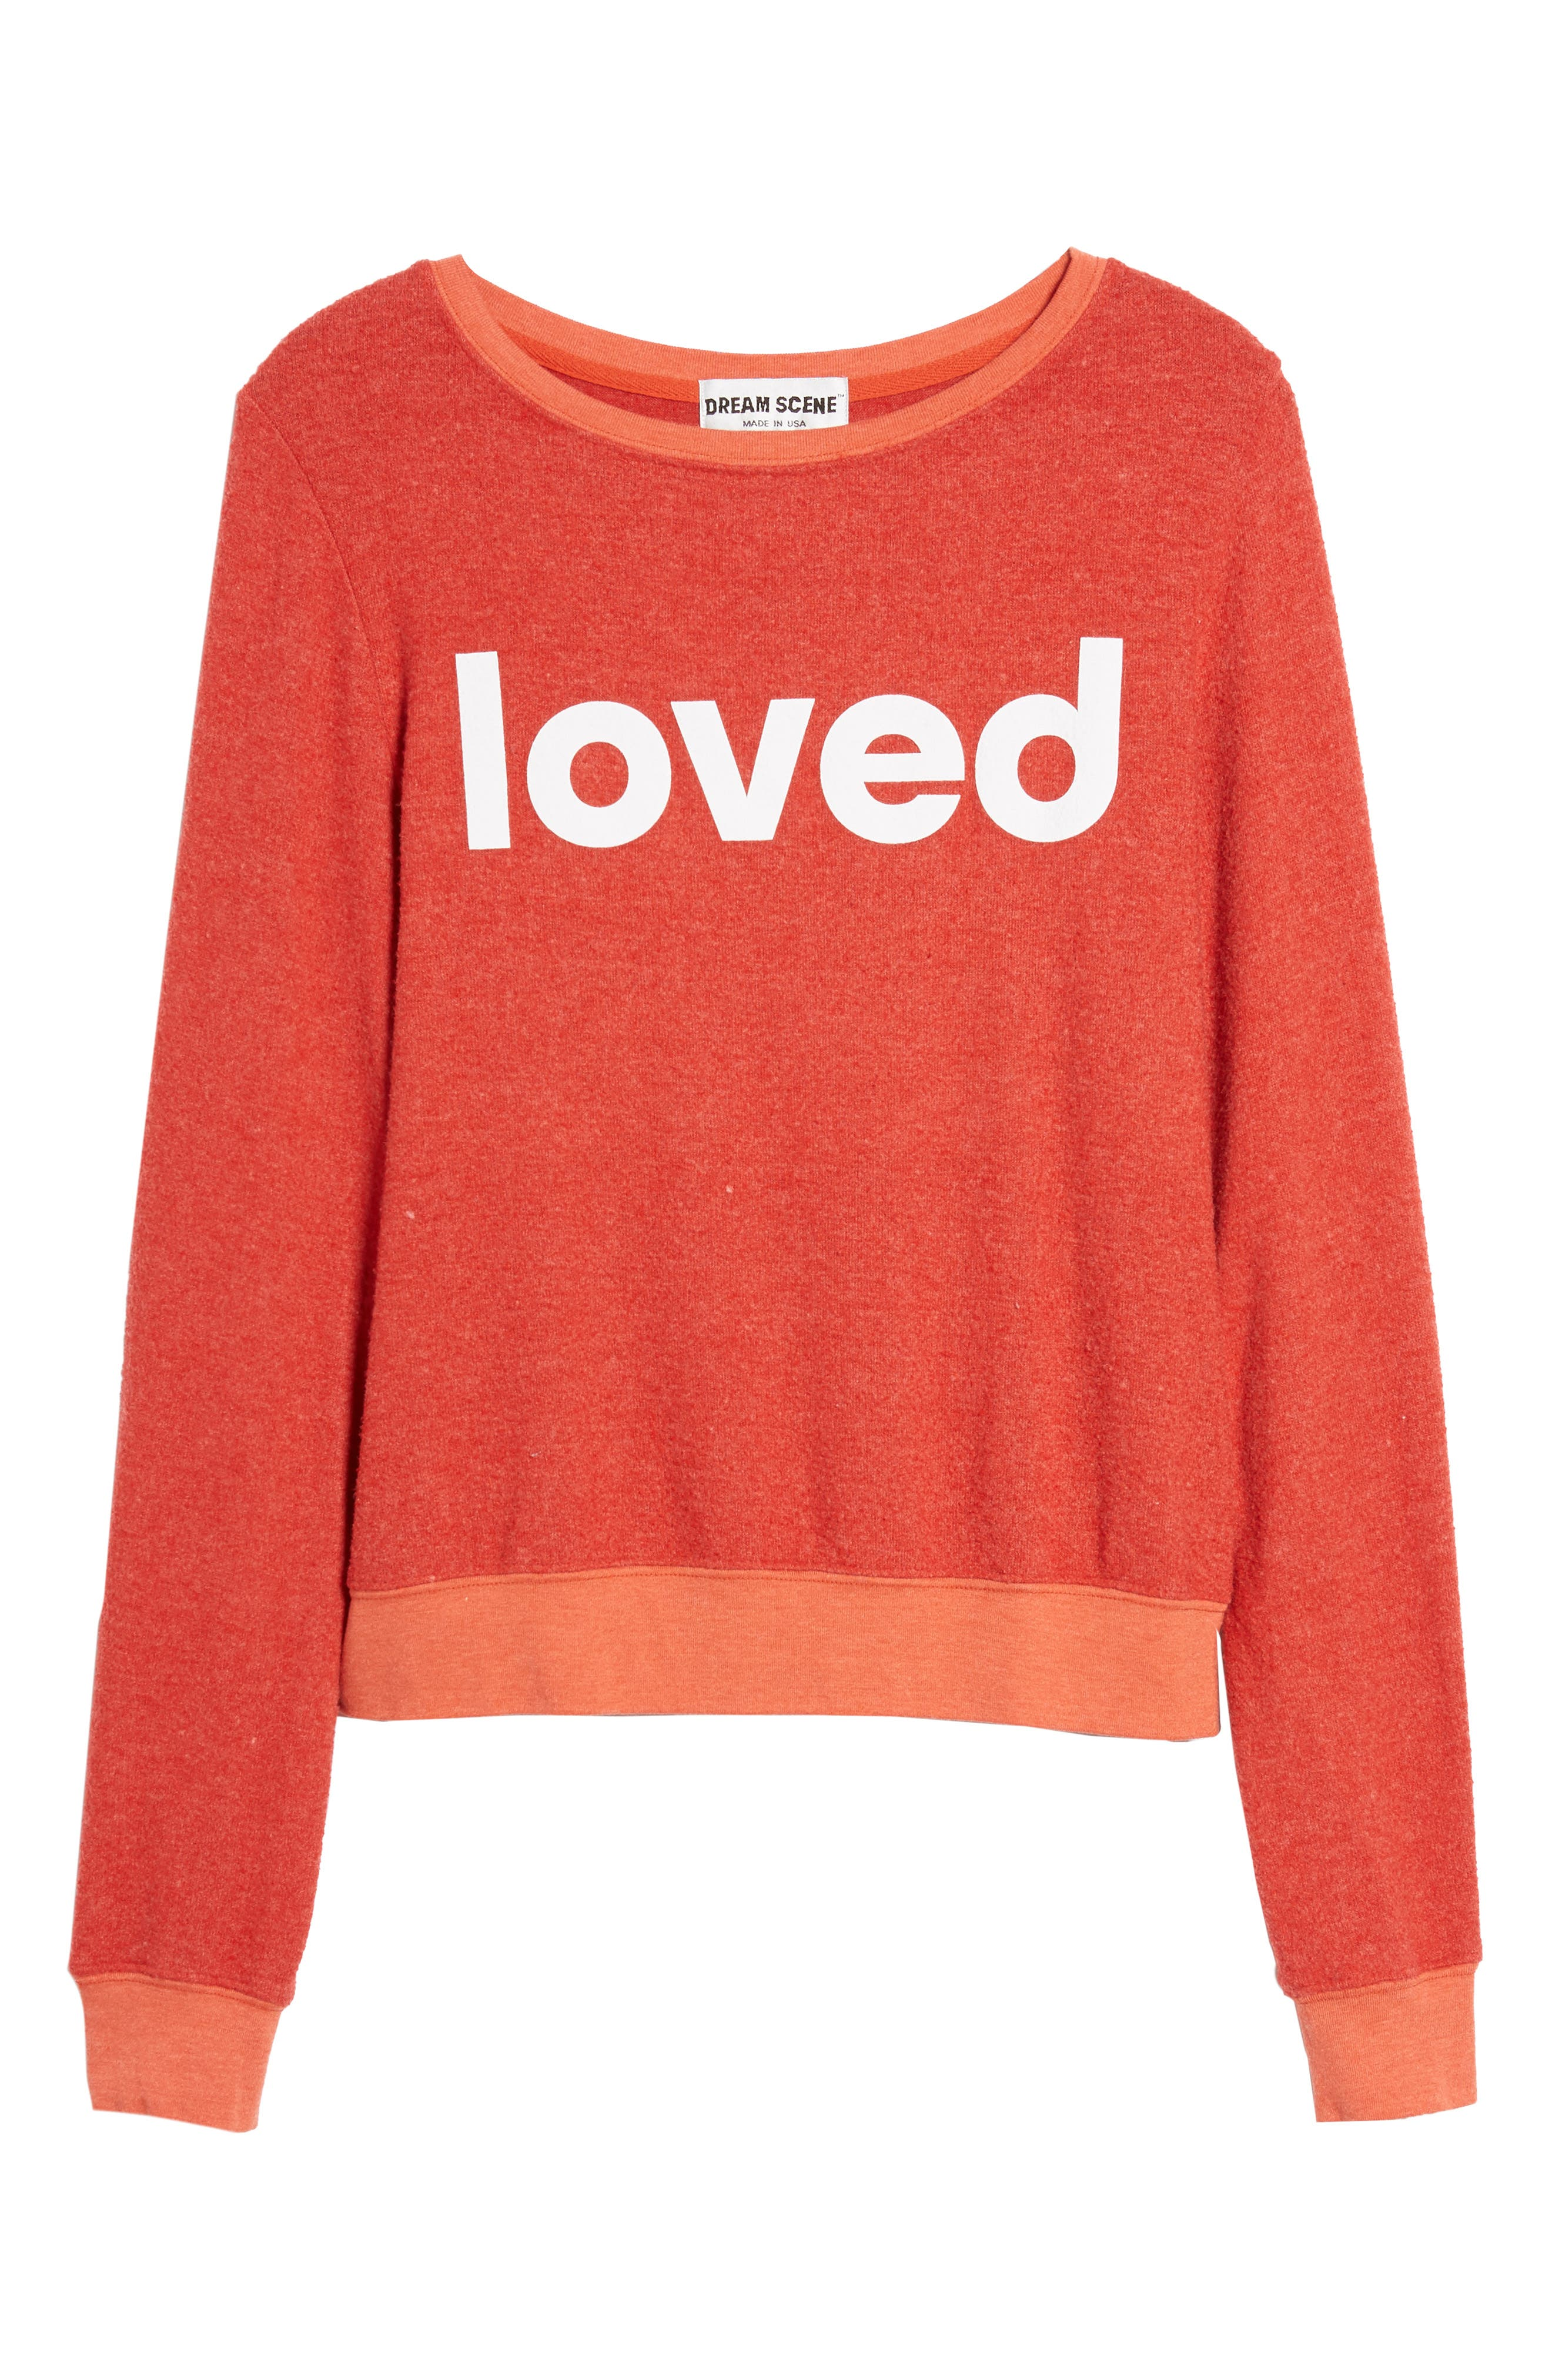 Alternate Image 7  - Dream Scene Loved Sweatshirt